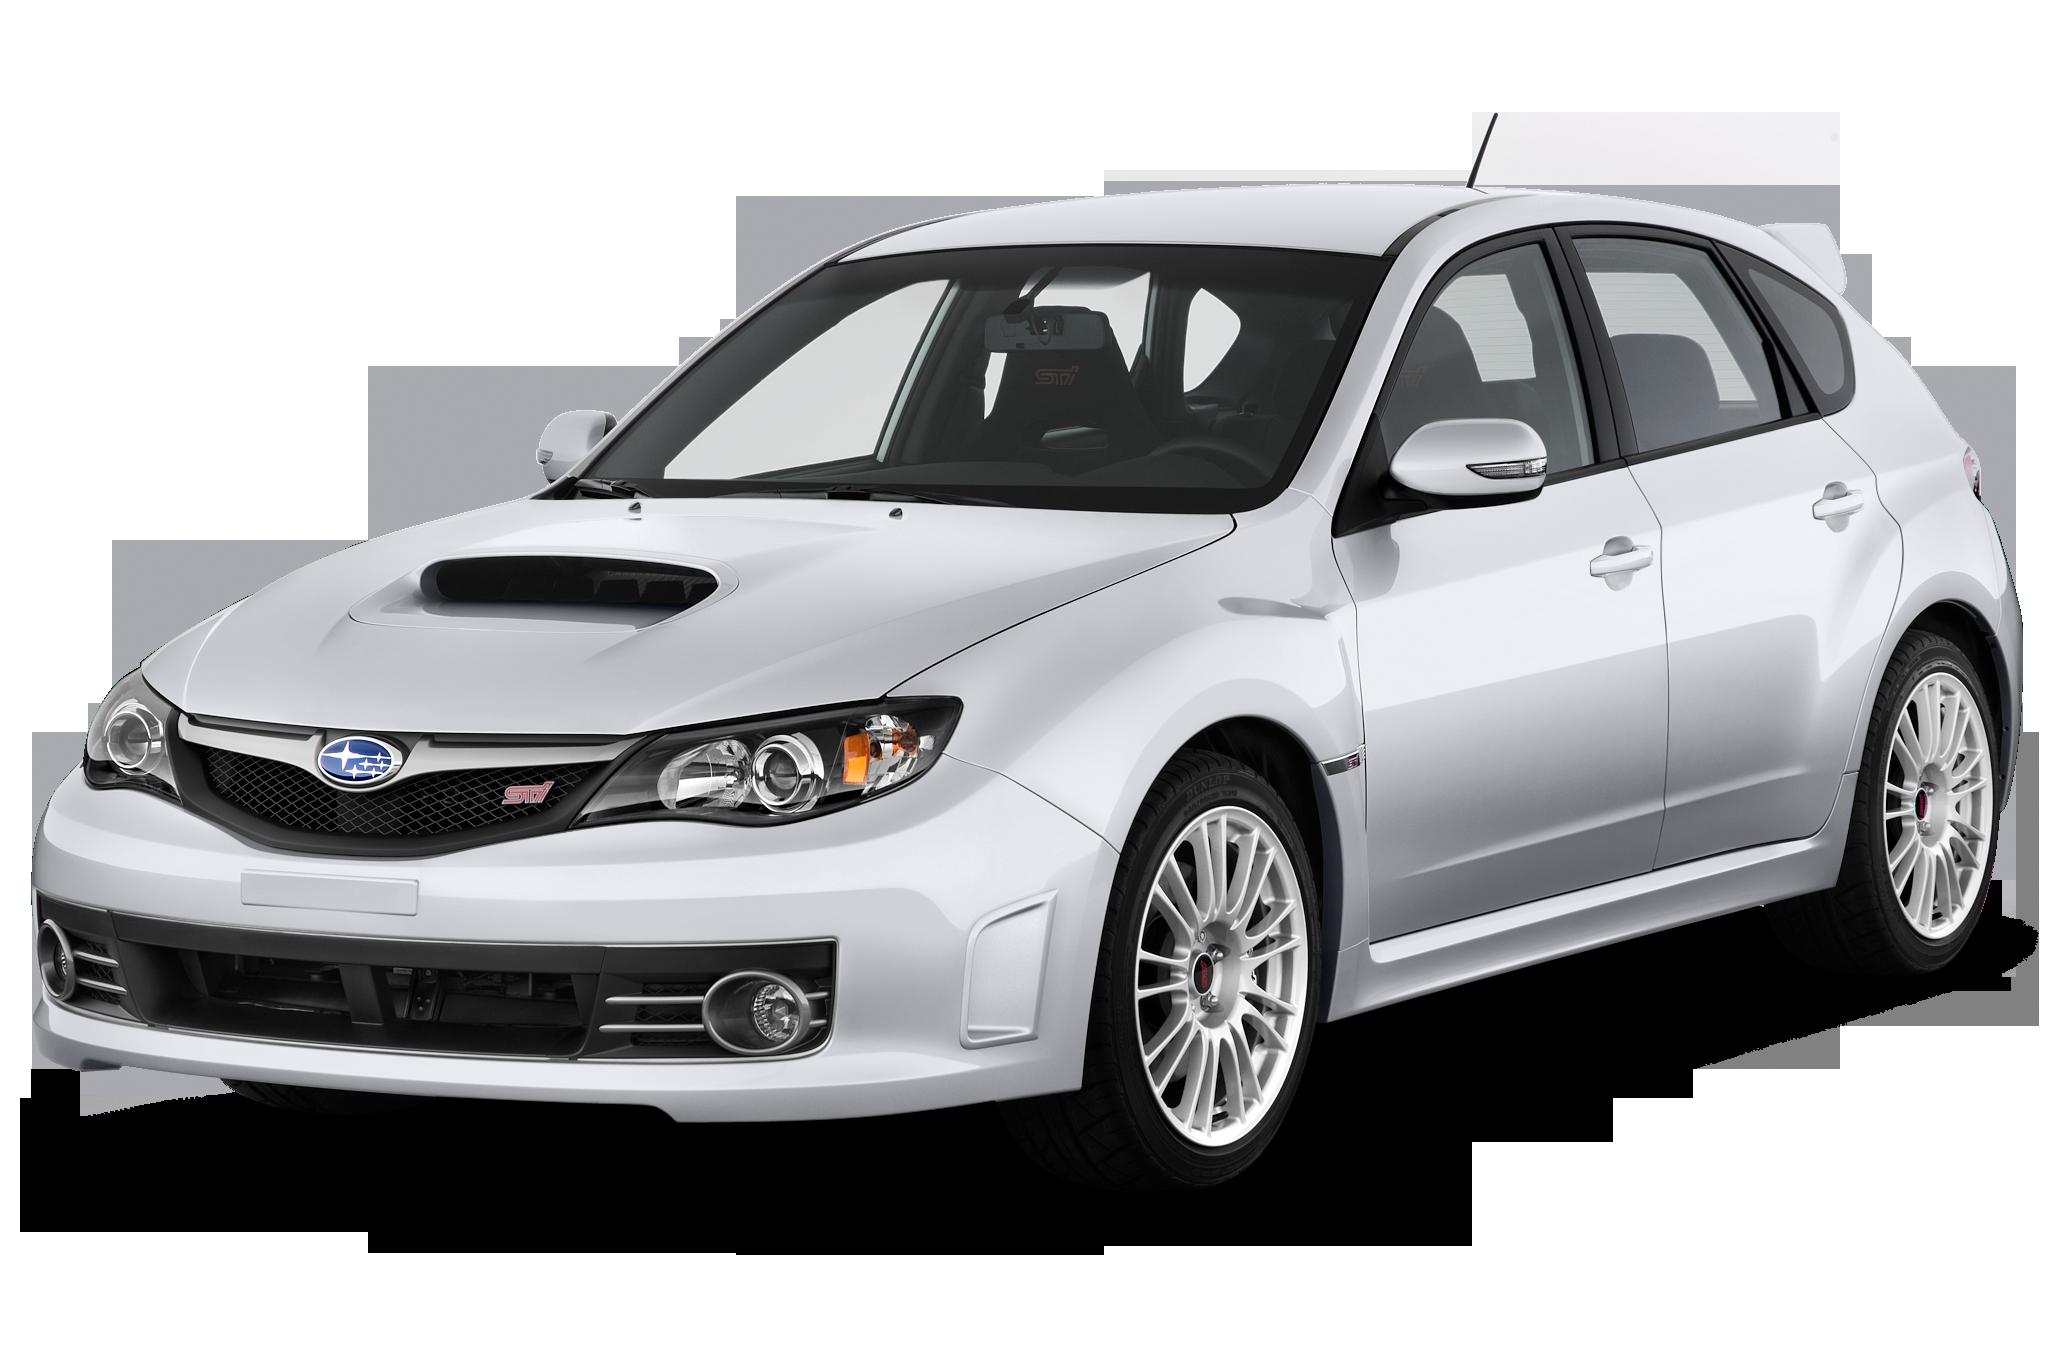 2010 Subaru Impreza Wrx Sti Special Edition Subaru Sport